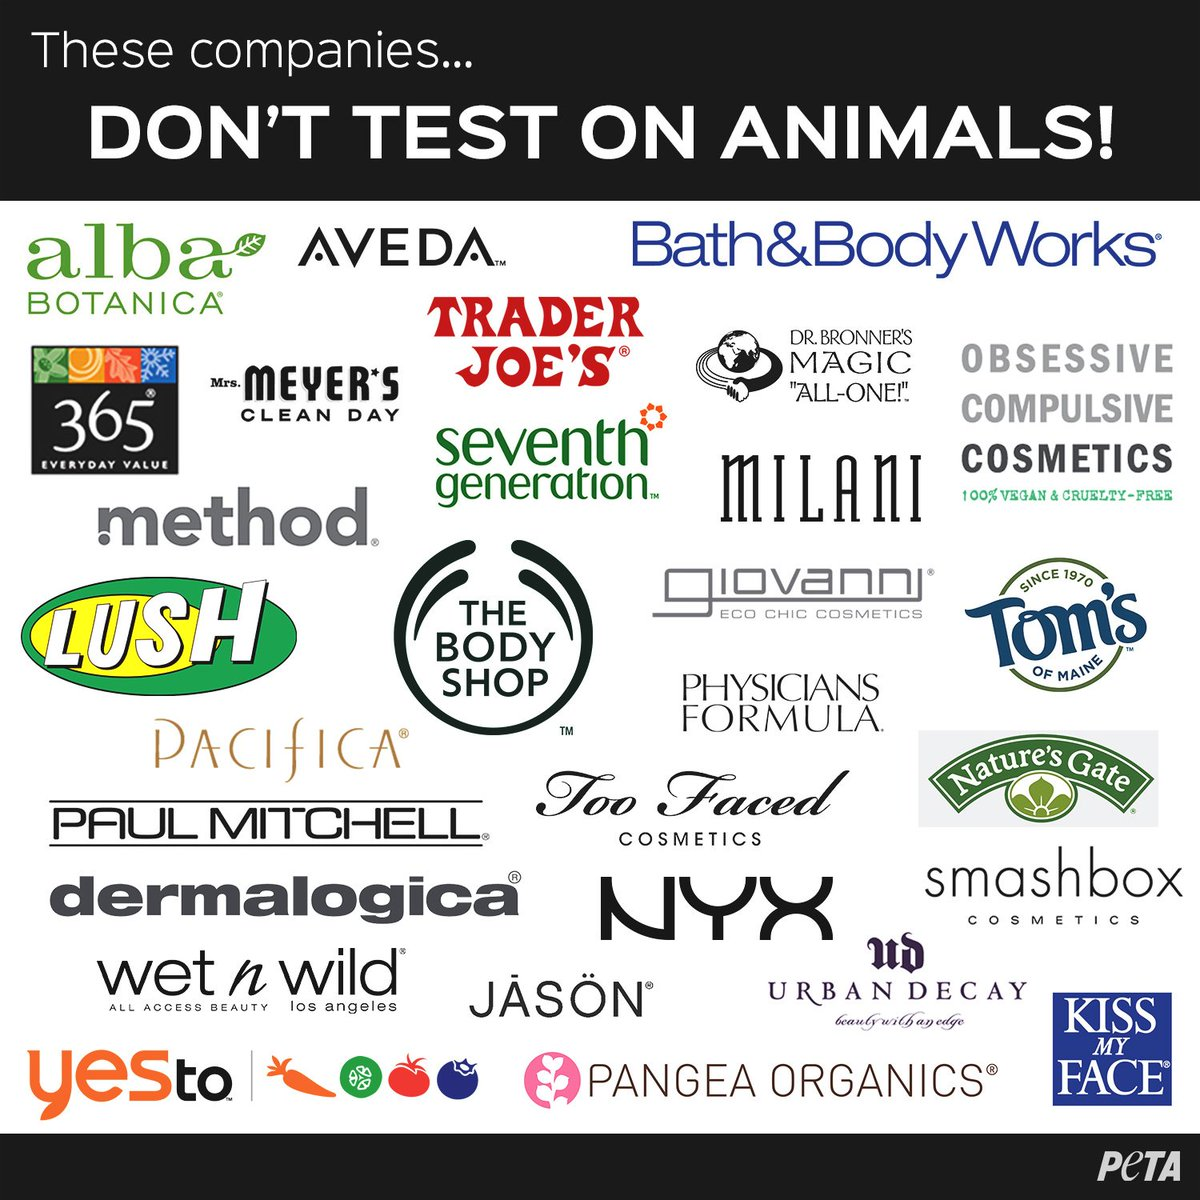 "peta on twitter: ""these companies don't test on animals"